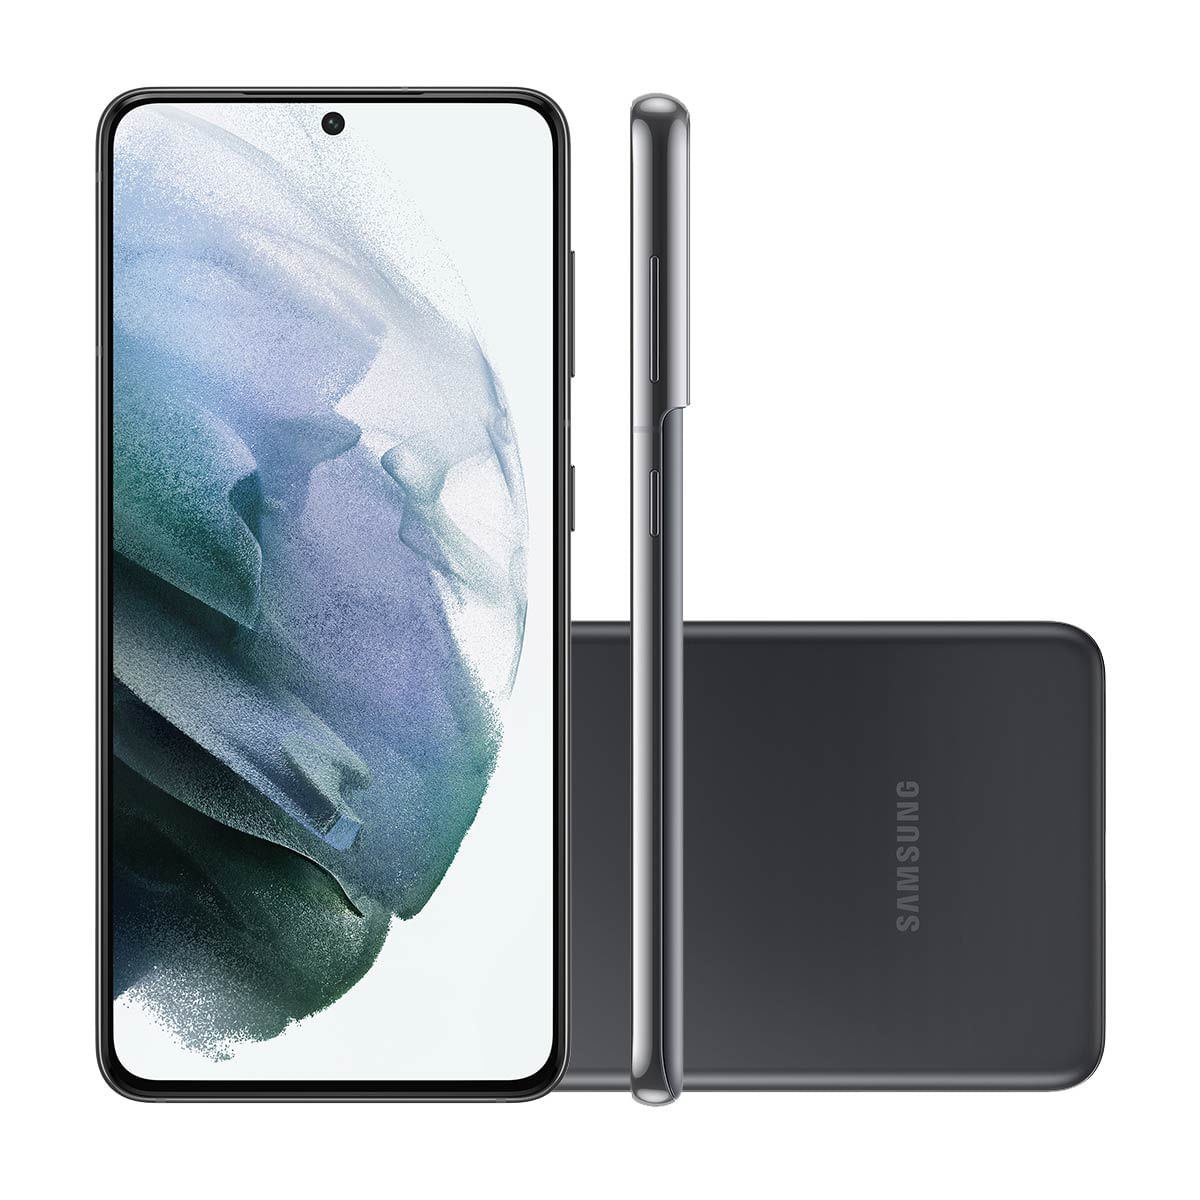 "Smartphone Samsung Galaxy S21 5G 128GB Cinza Tela 6.2"" Câmera Tripla 64MP Selfie 10MP Dual Chip Android 11"